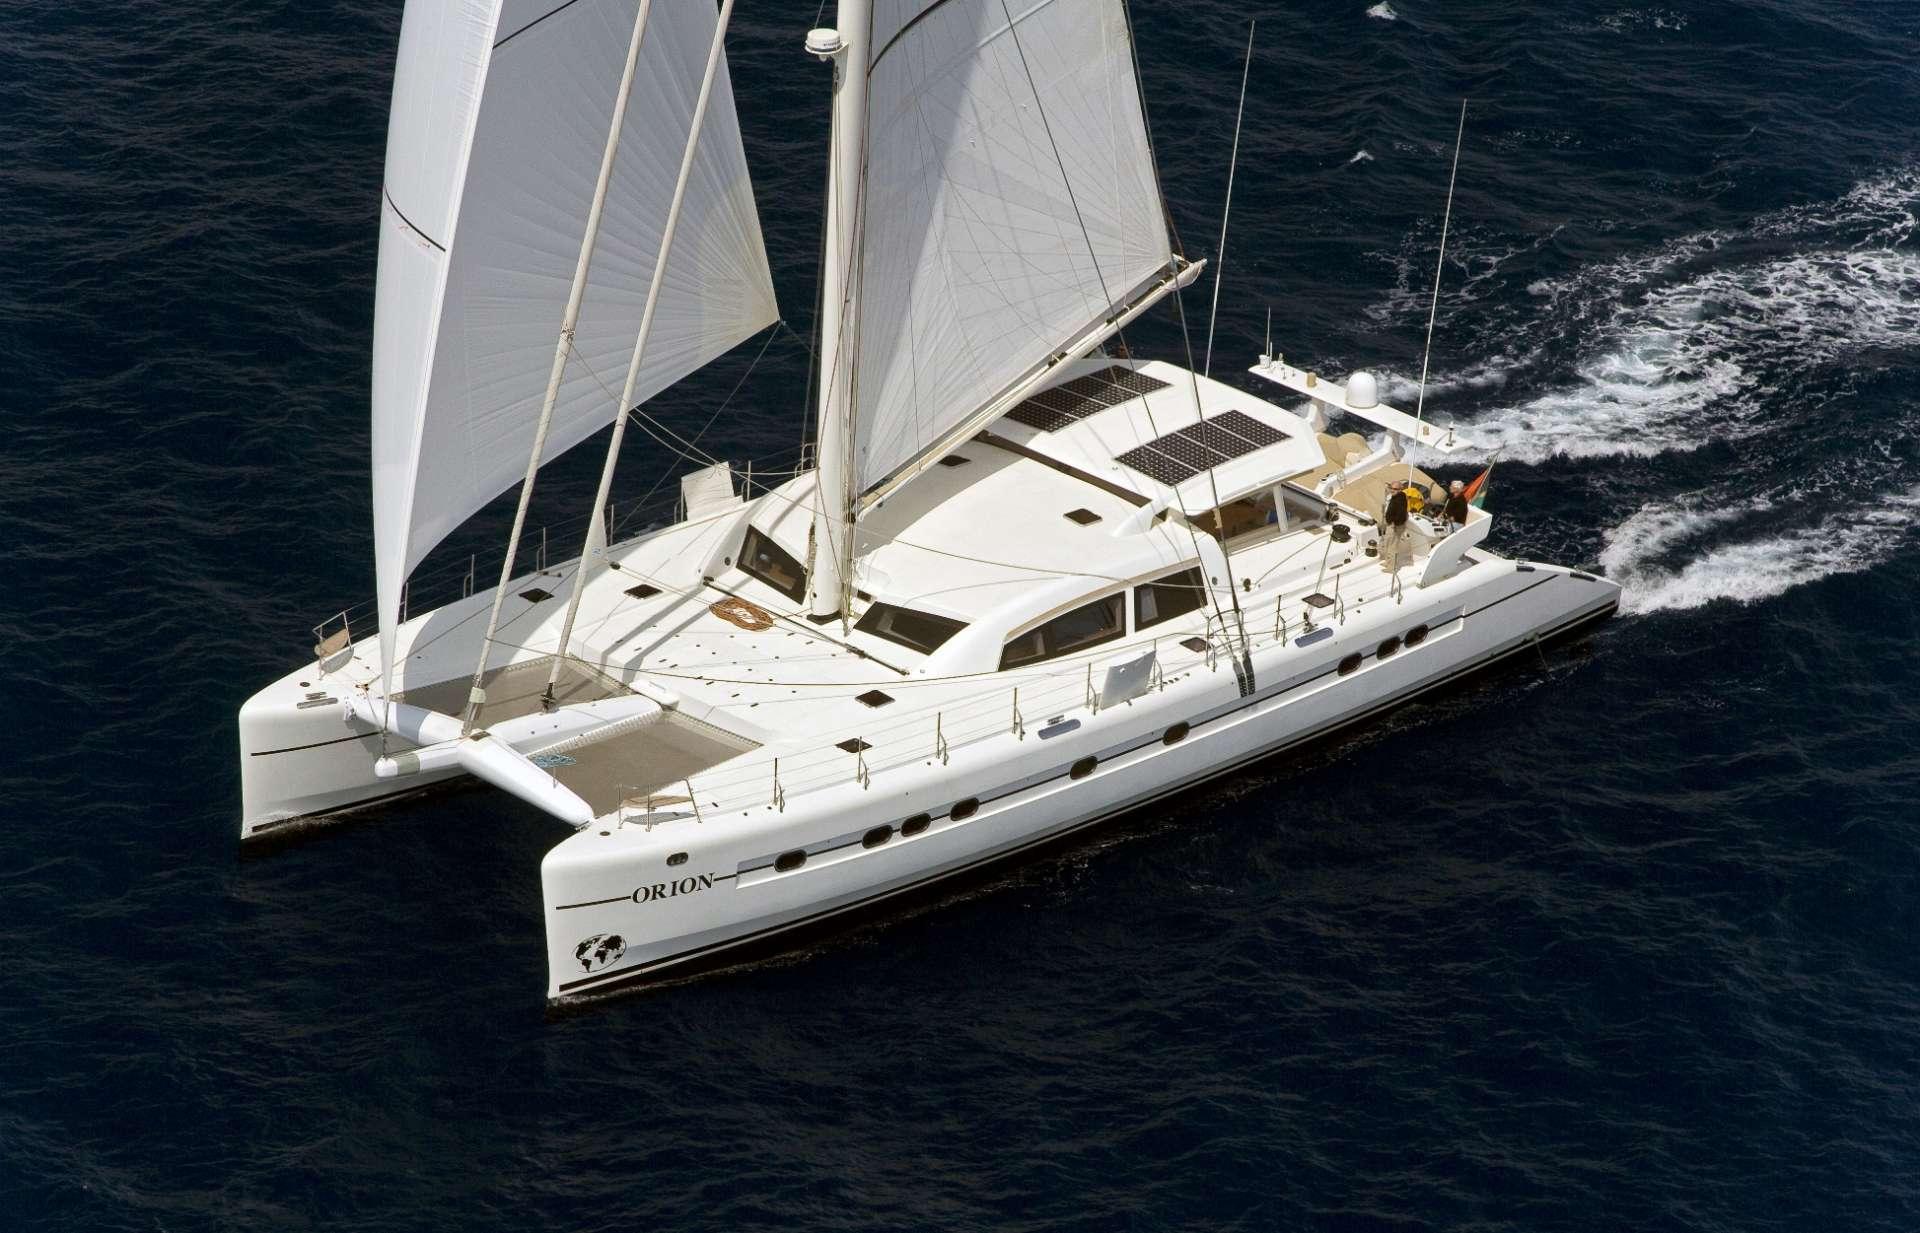 Cat Yacht 'Cat', 8 PAX, 4 Crew, 90.00 Ft, 27.00 Meters, Built 2008, Catana, Refit Year 2019